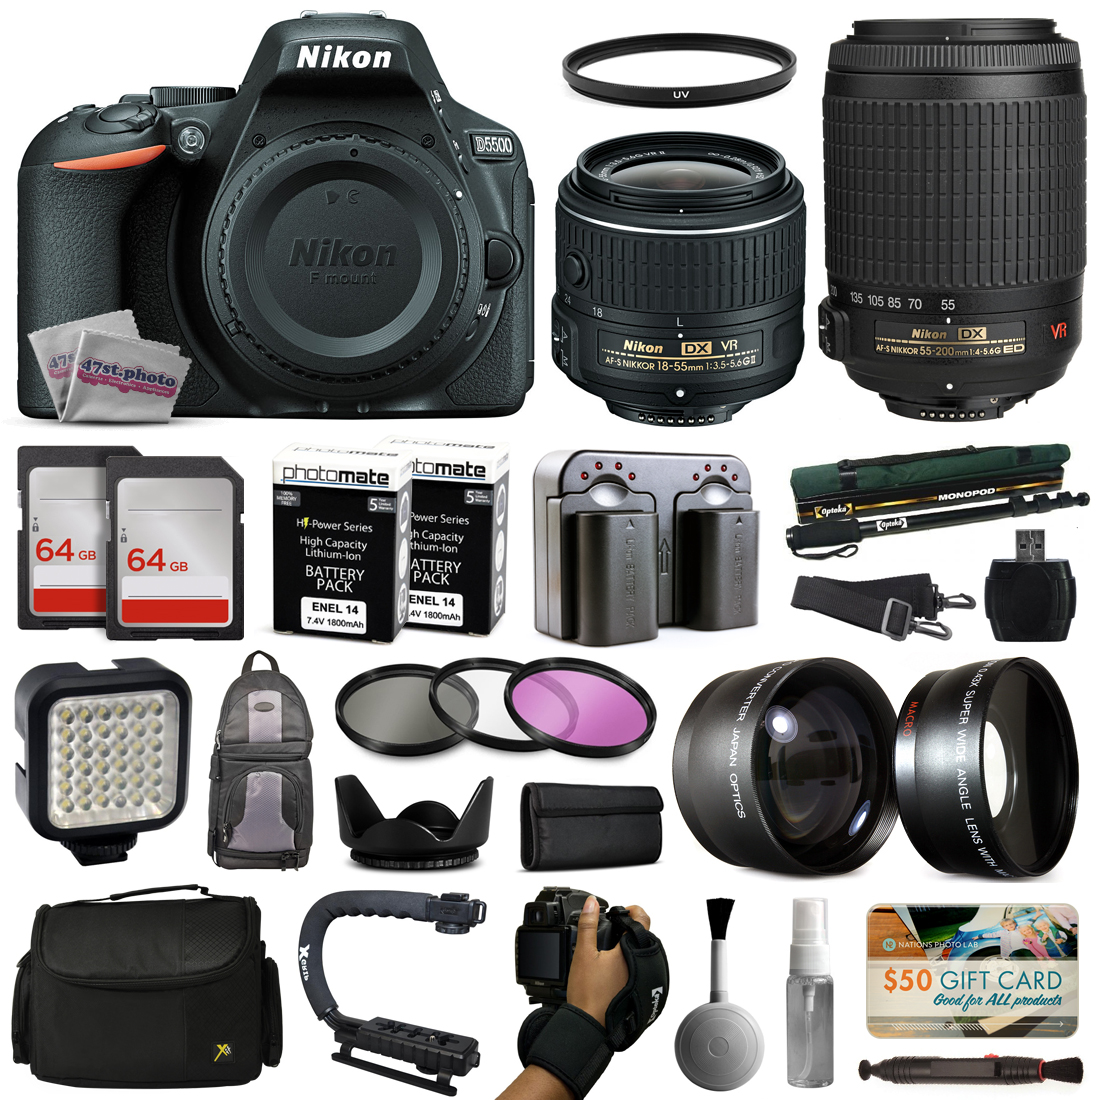 Nikon D5500 Digital Camera with 18-55mm Lens (1546) + 55-...